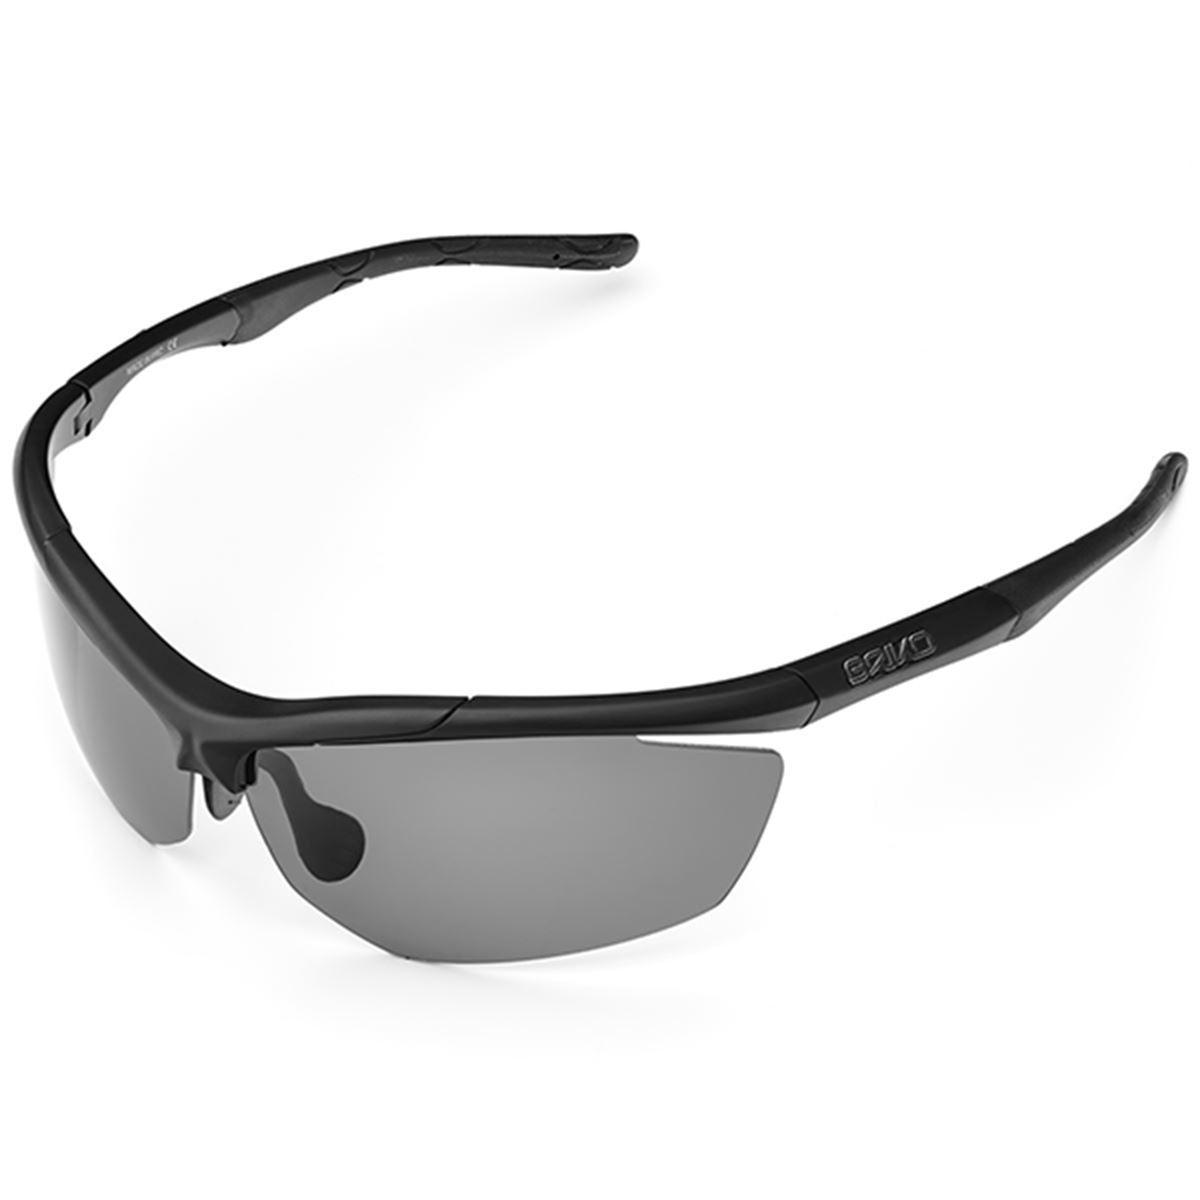 47a83c5be18 Briko TRIDENT Glasses